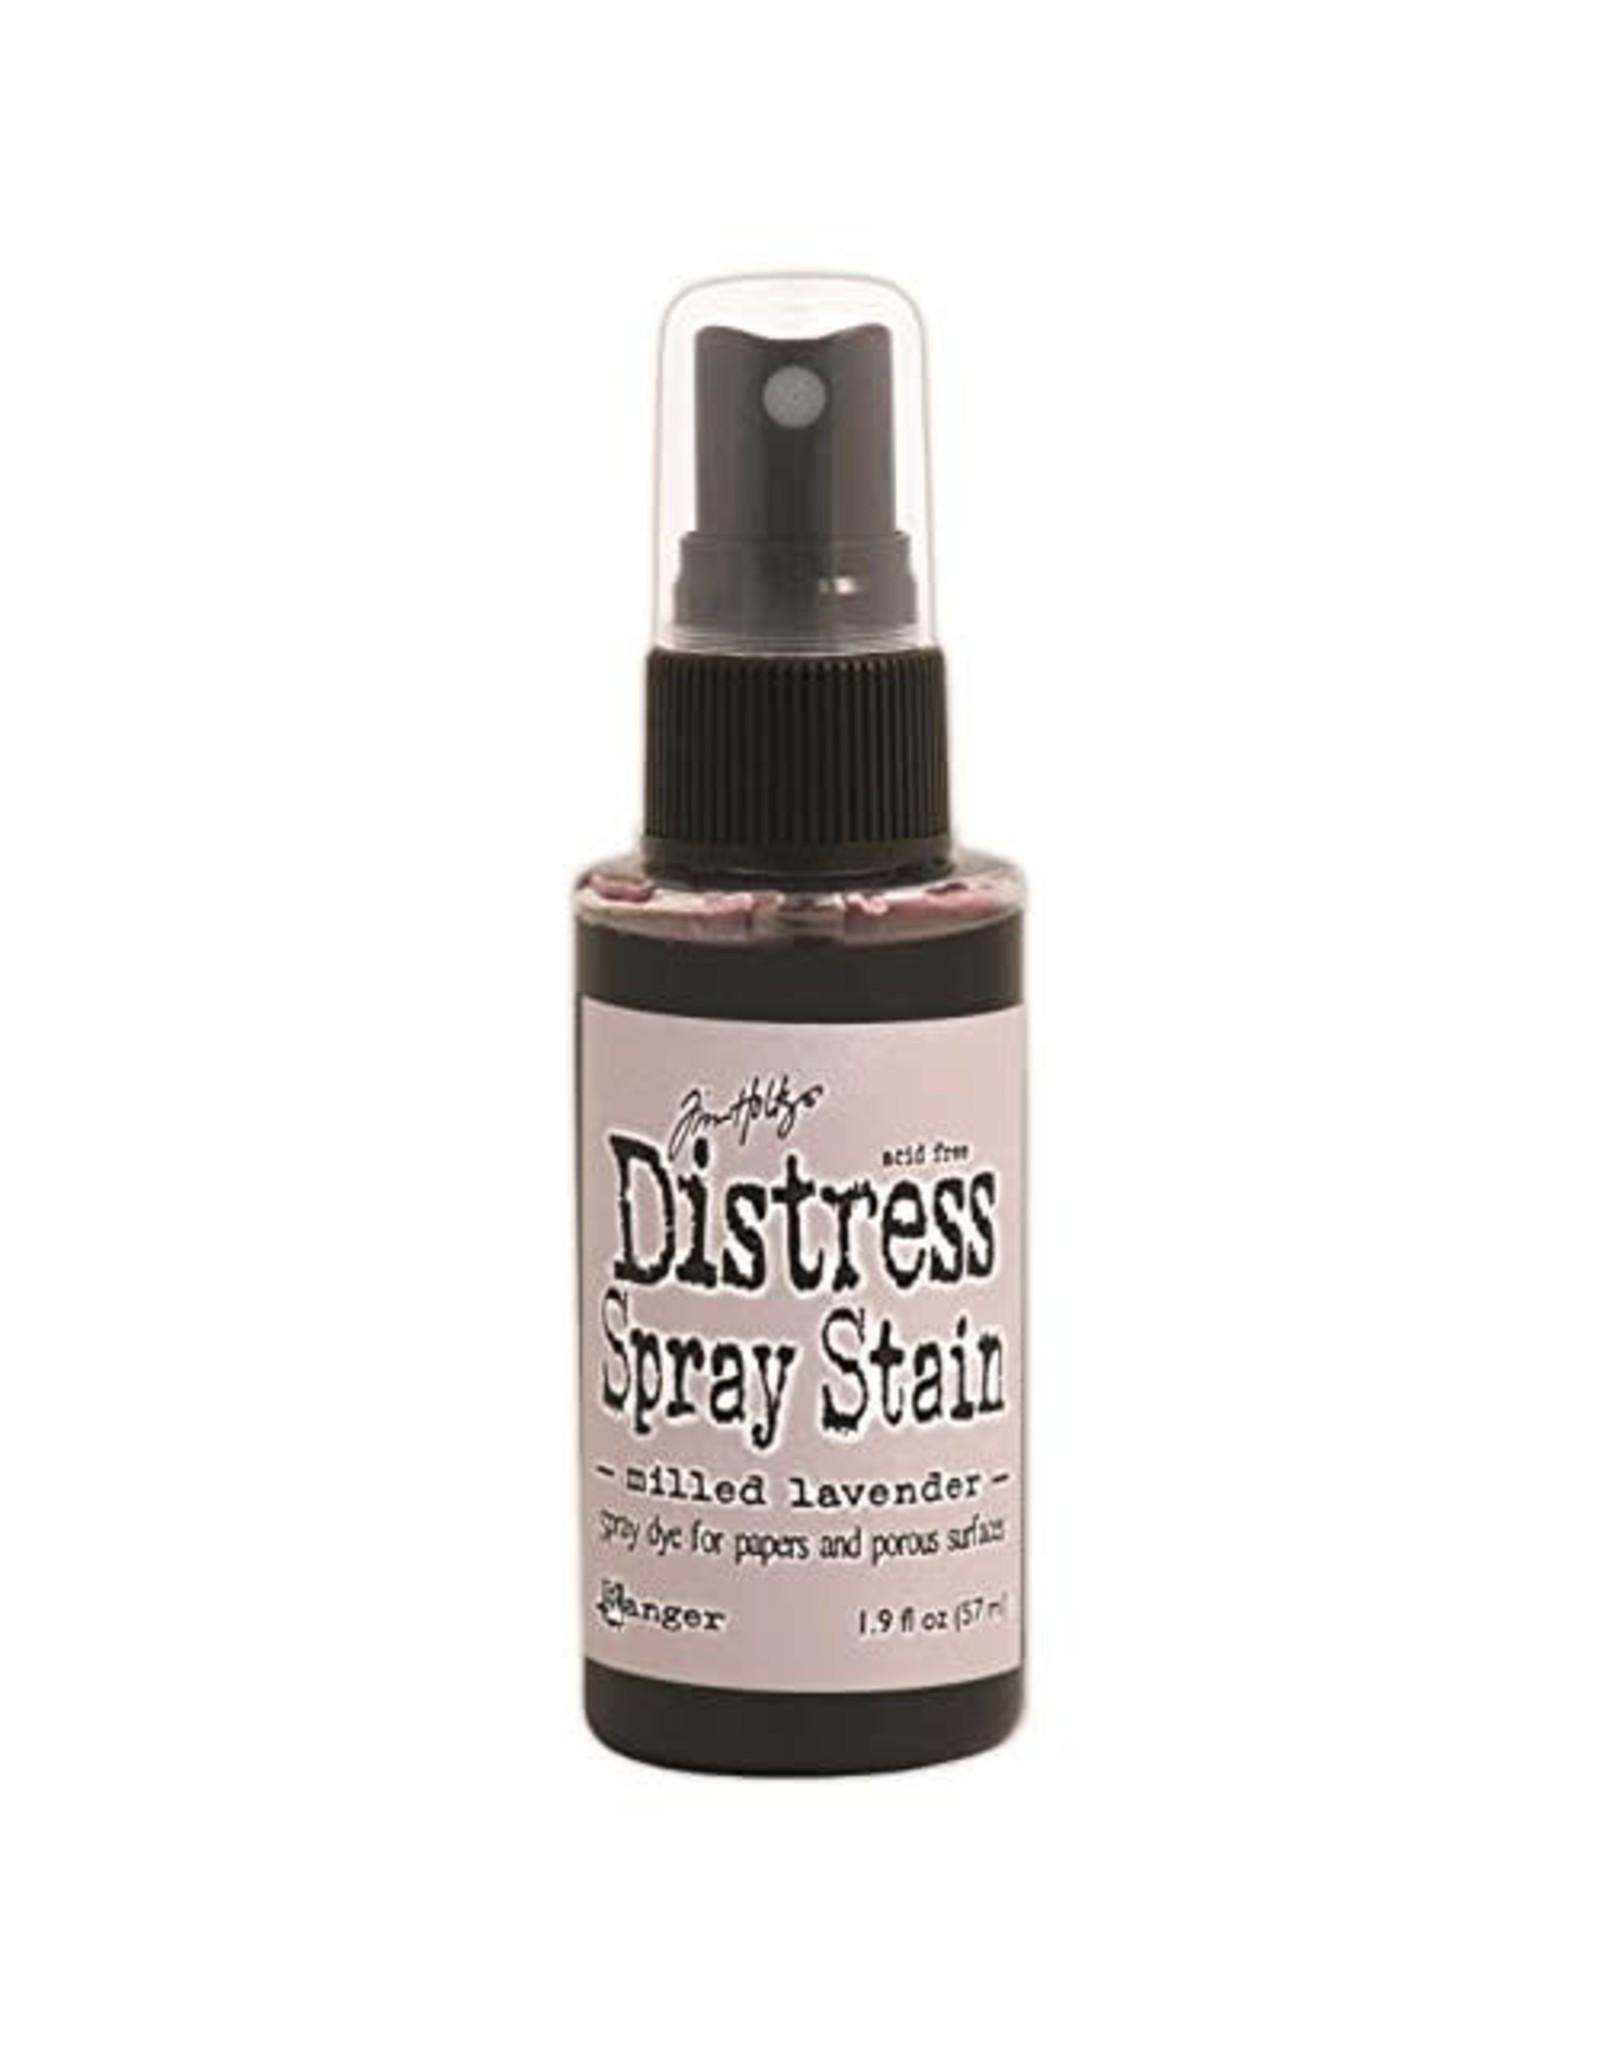 Ranger Distress Spray Stain - Milled Lavender